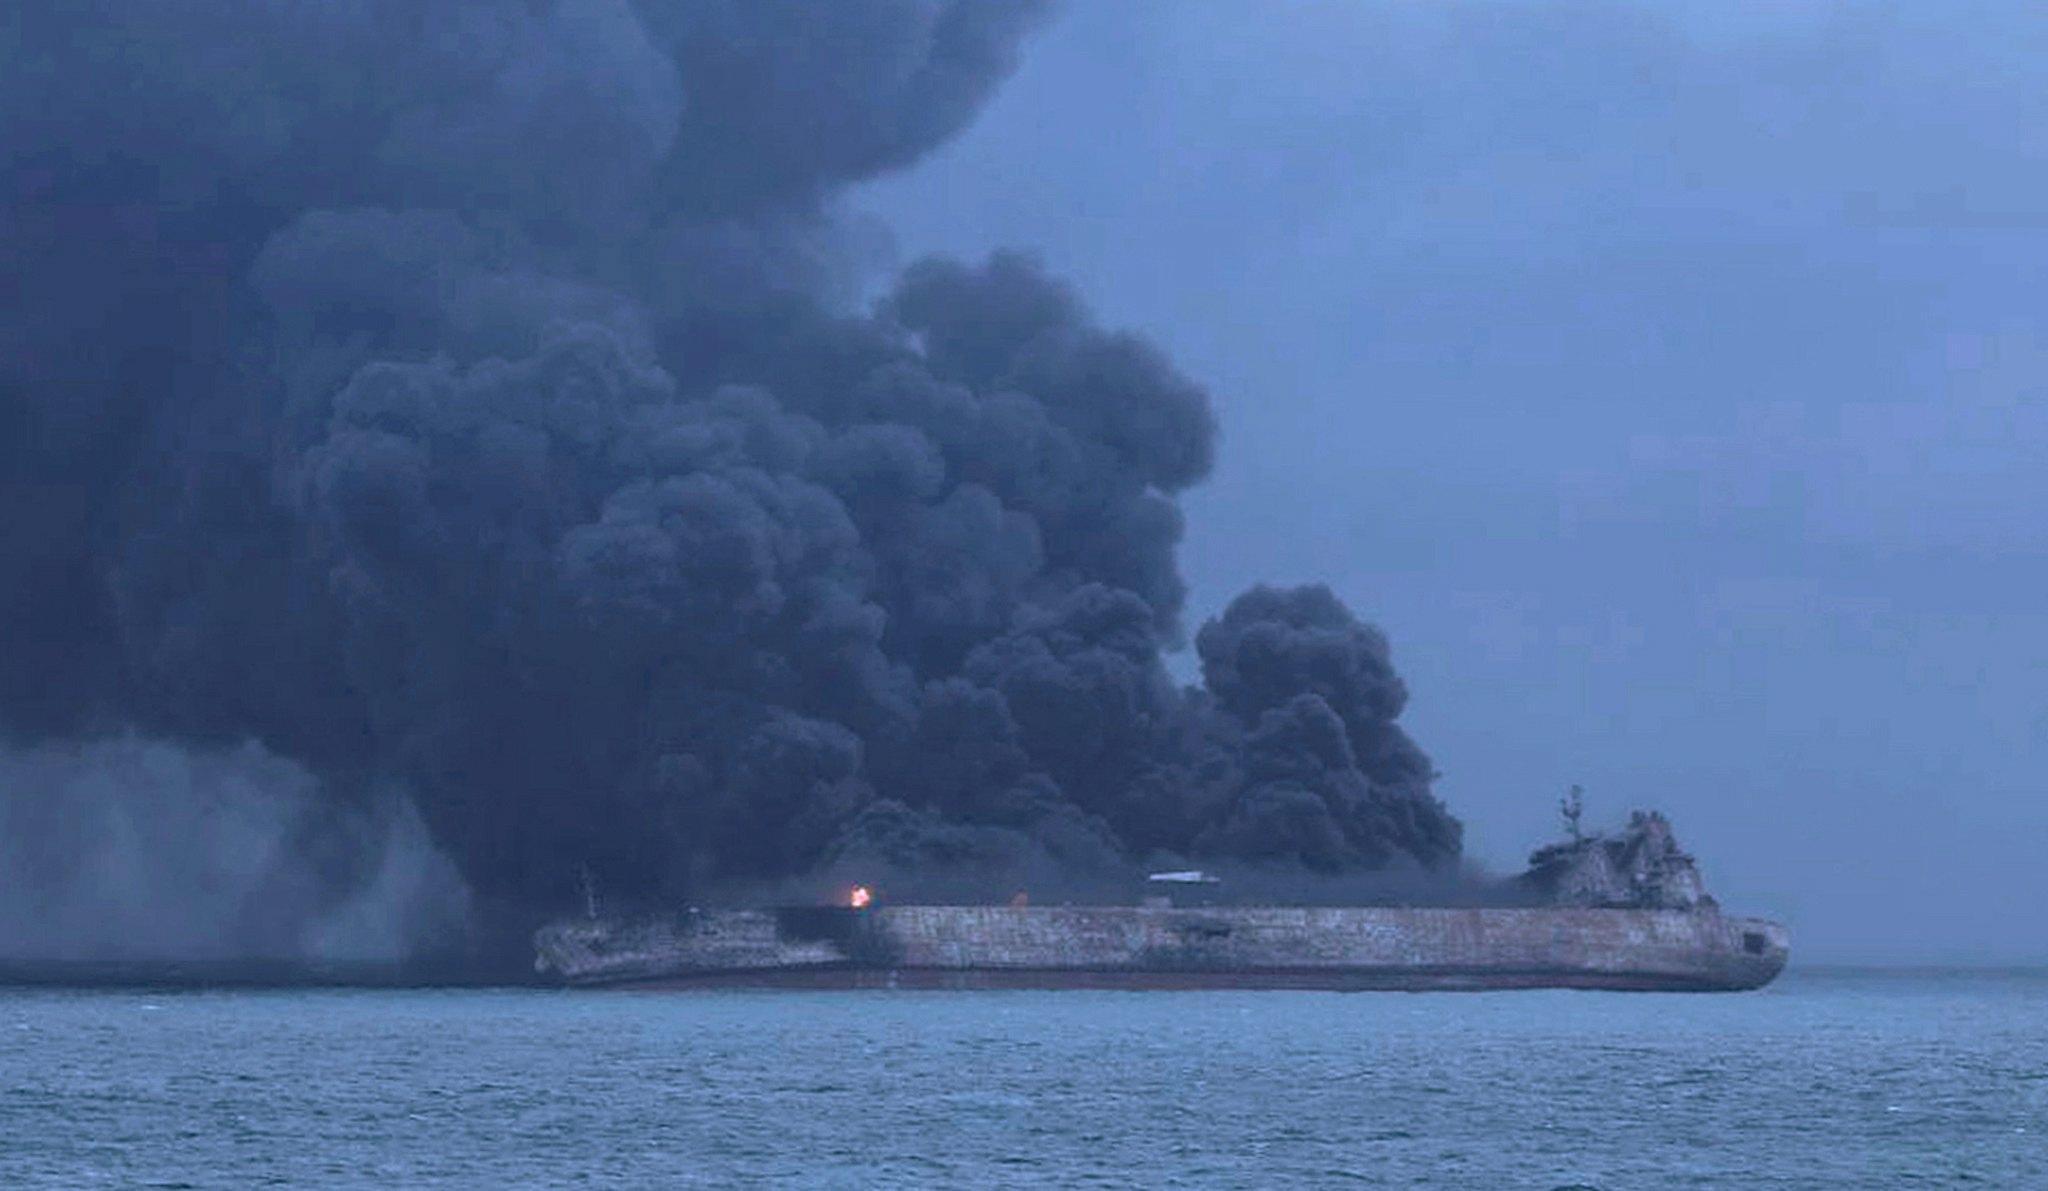 Cina: affondata petroliera Iran